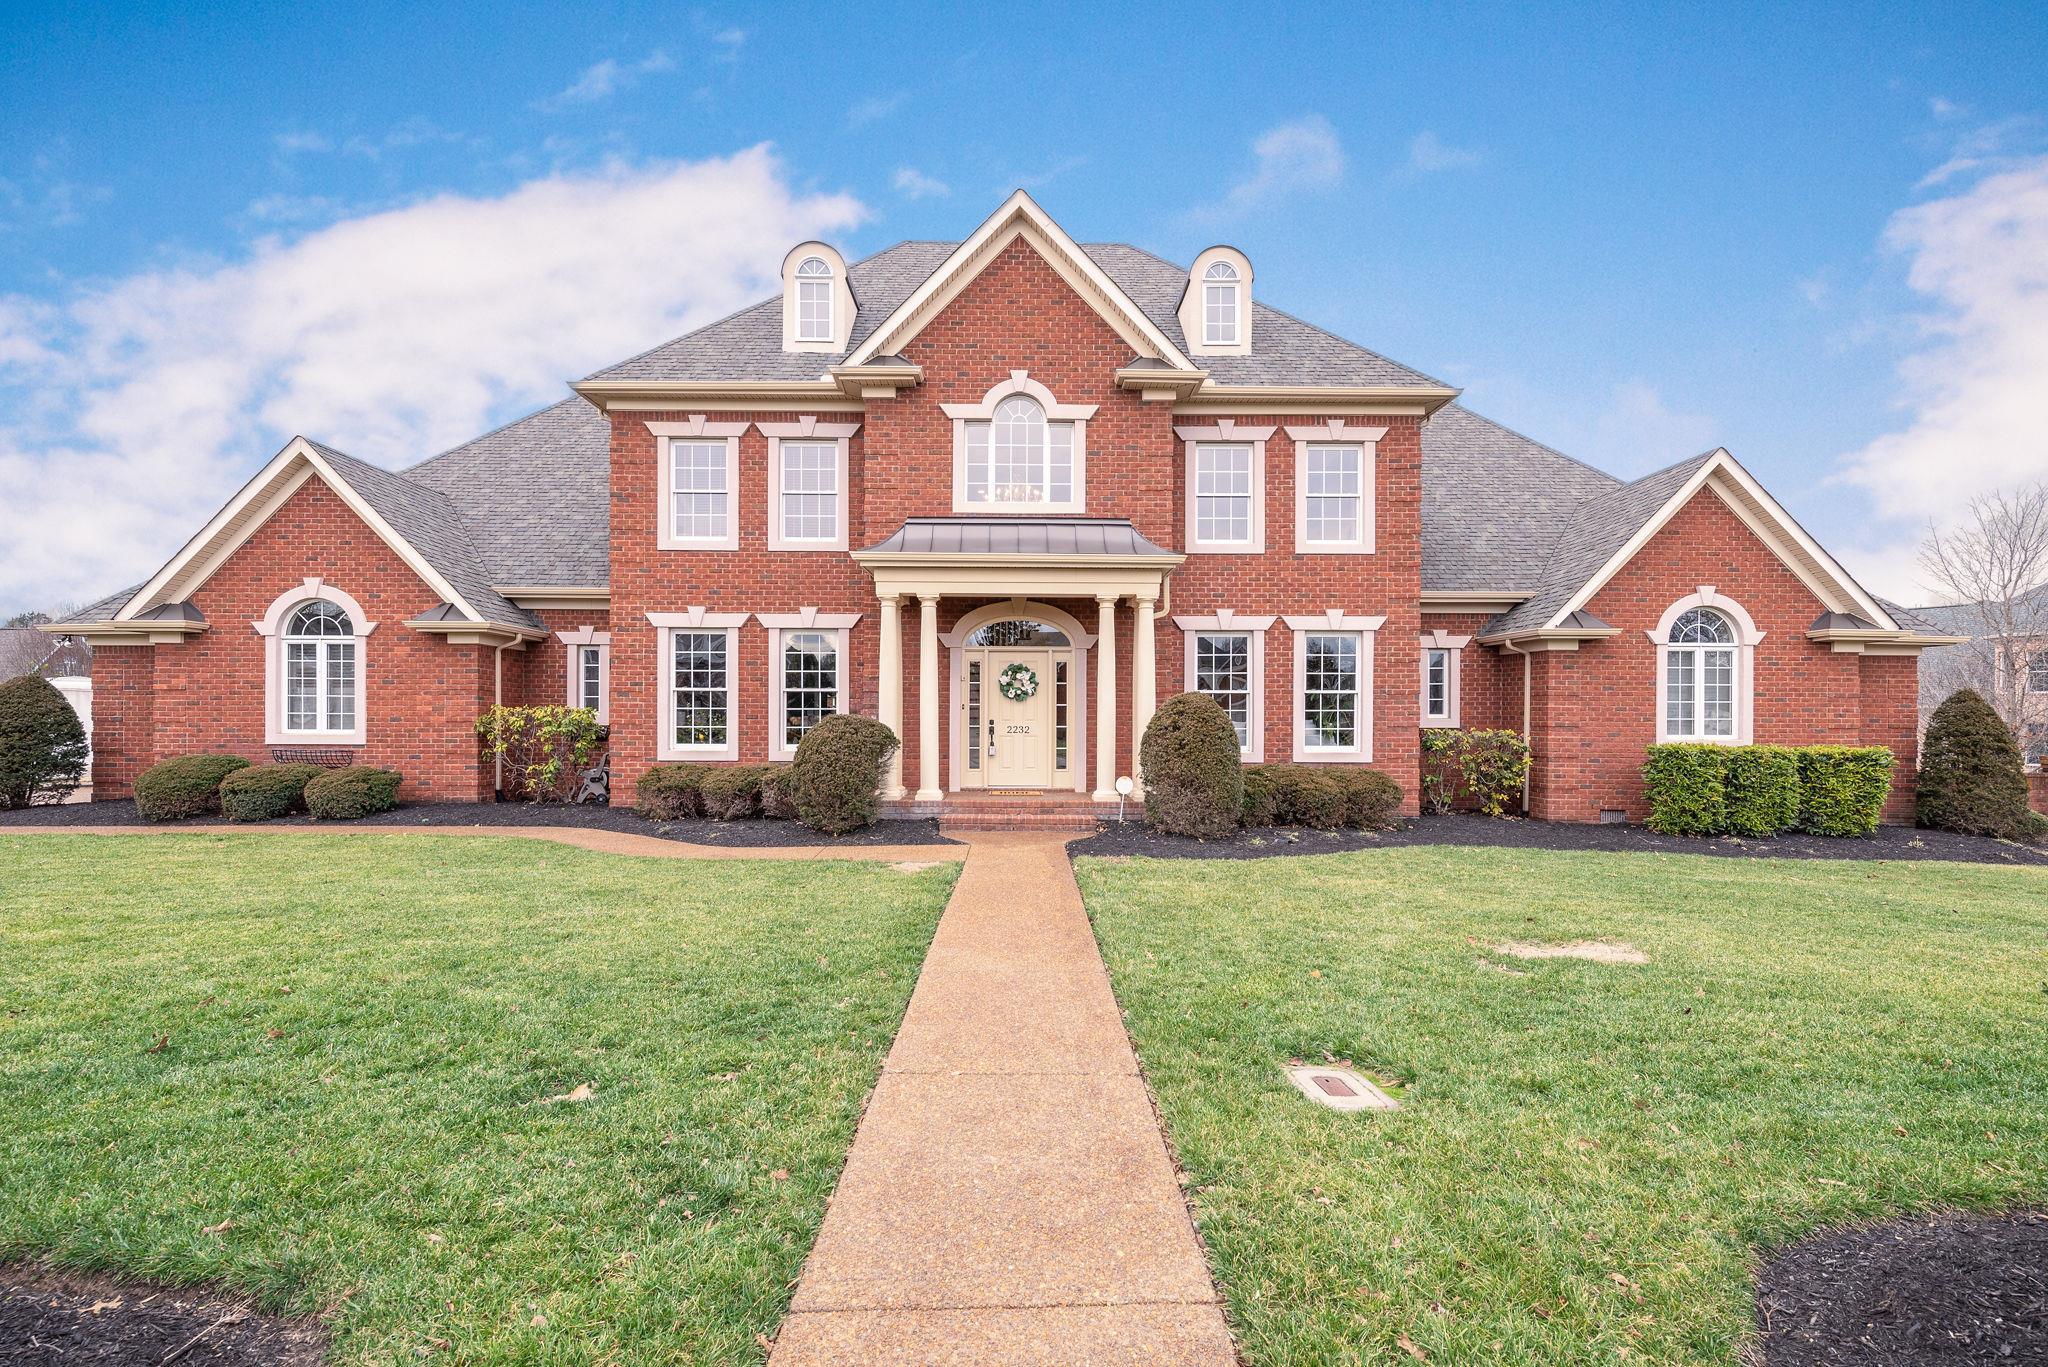 2232 Oakleigh Dr, Murfreesboro, Tennessee